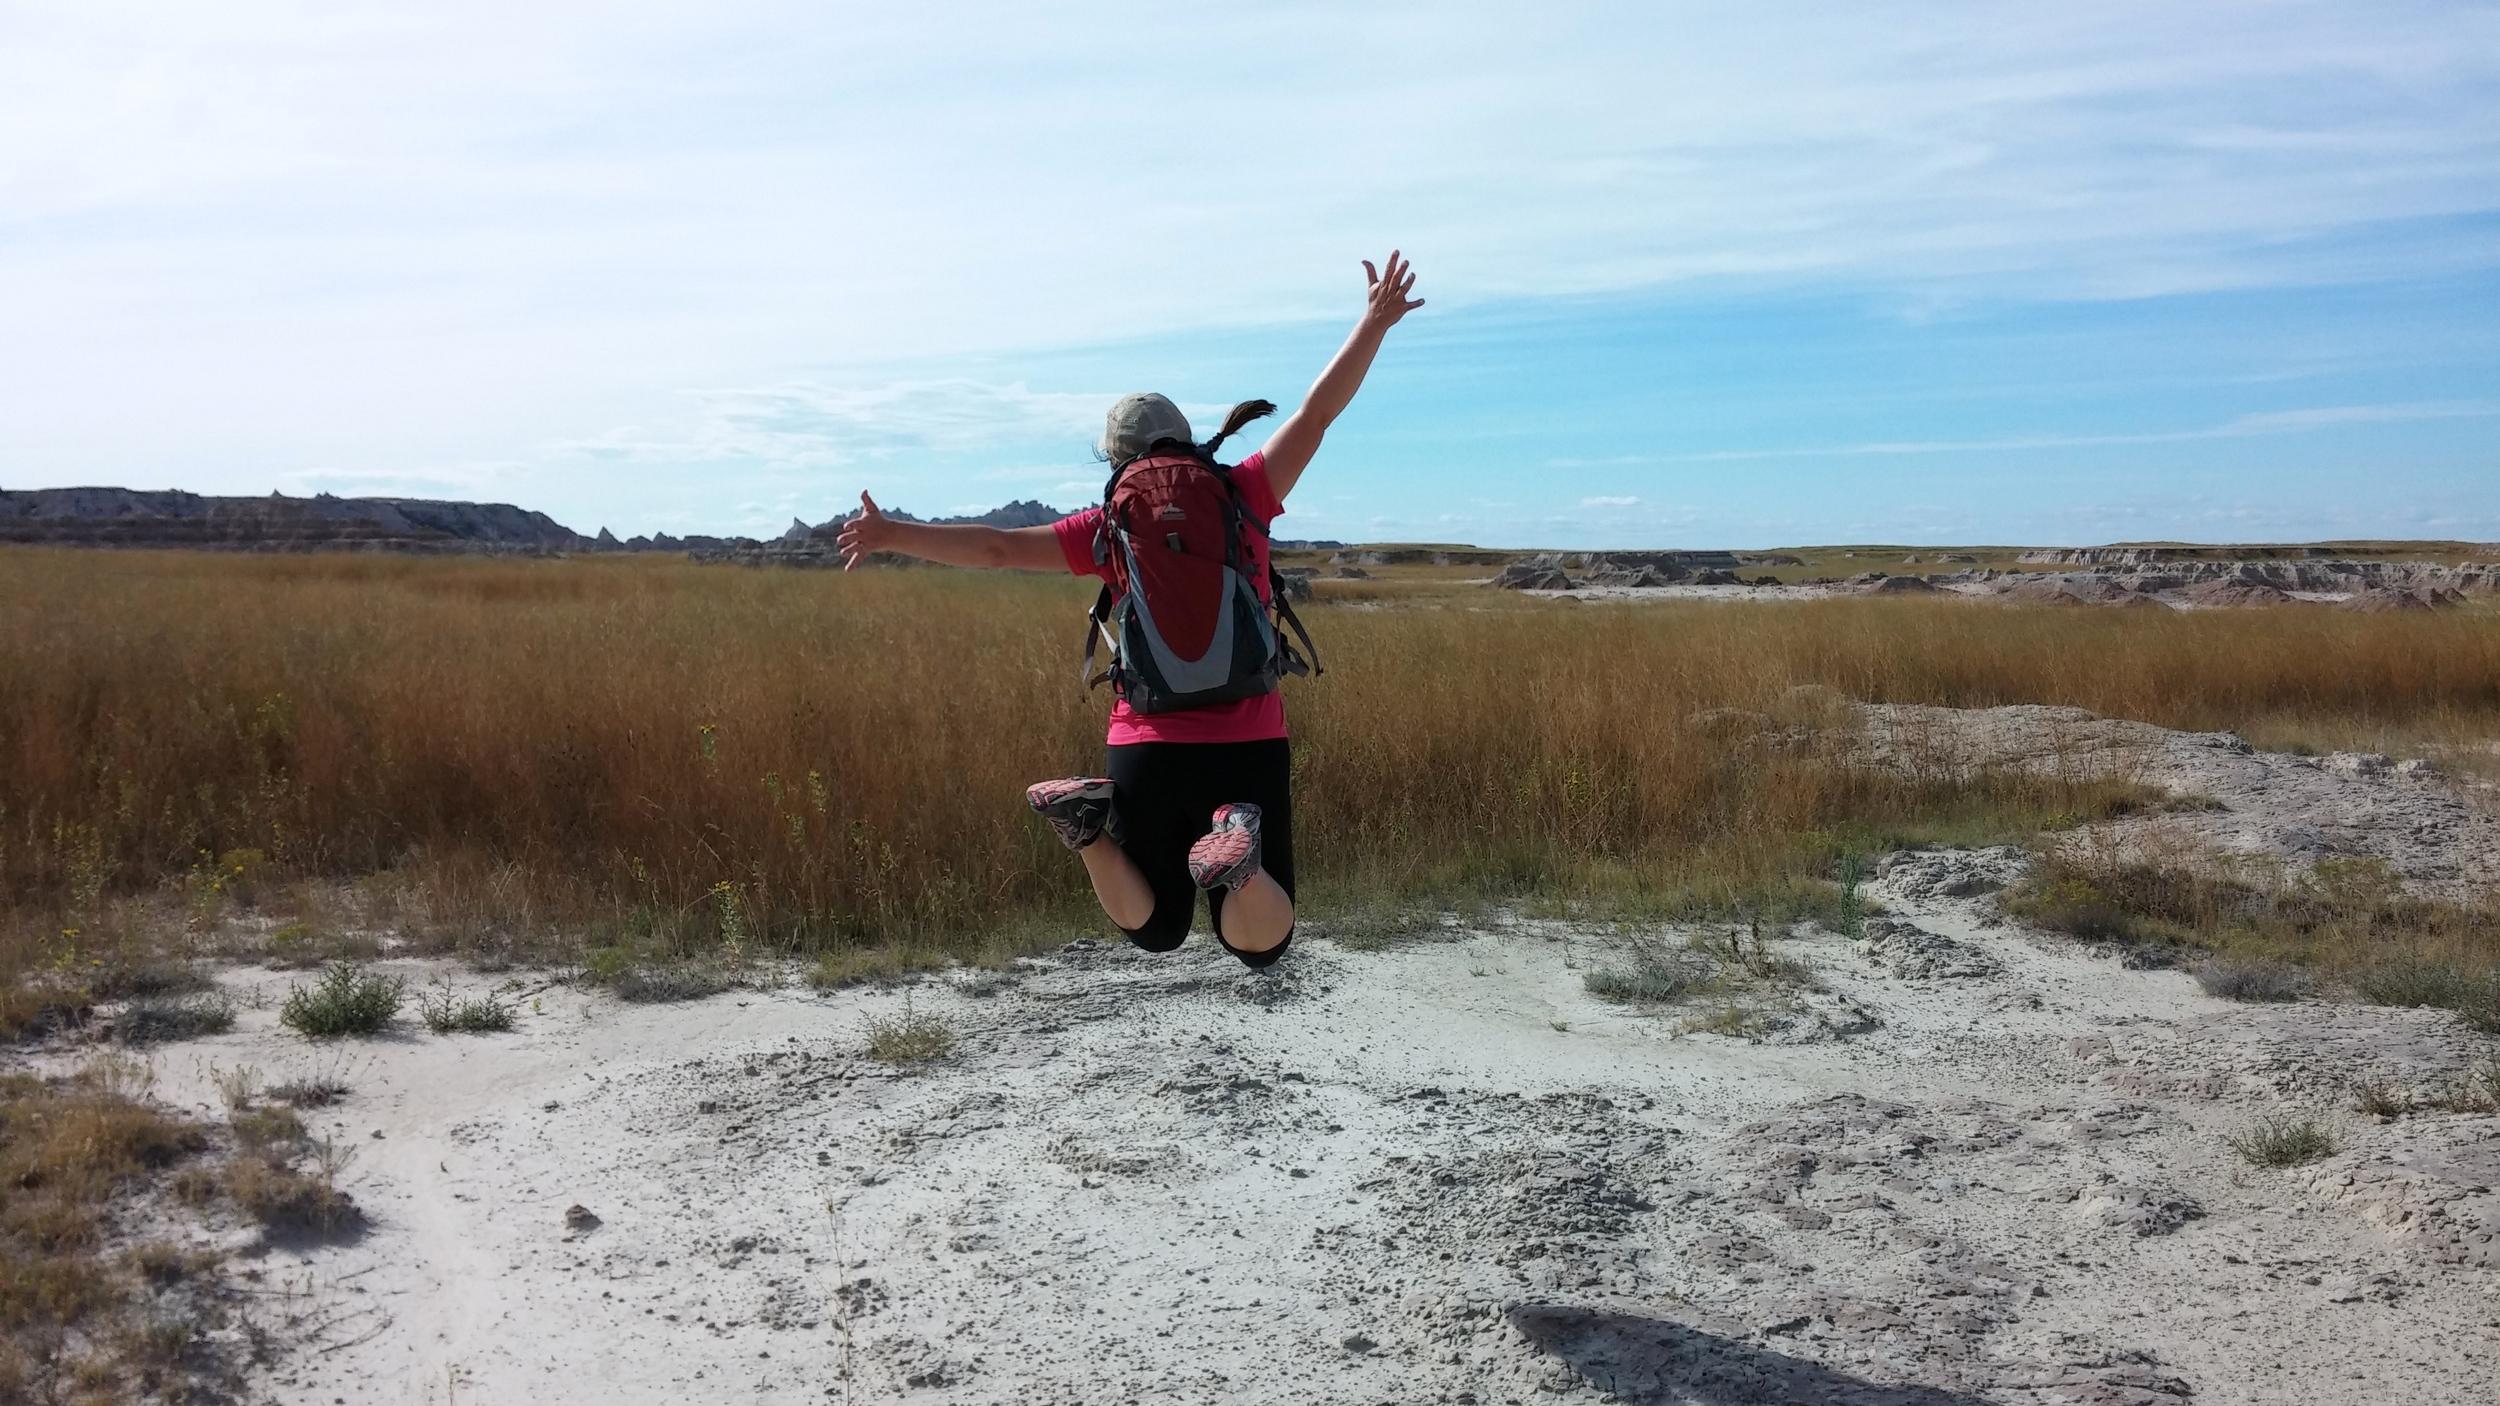 ld jump badlands